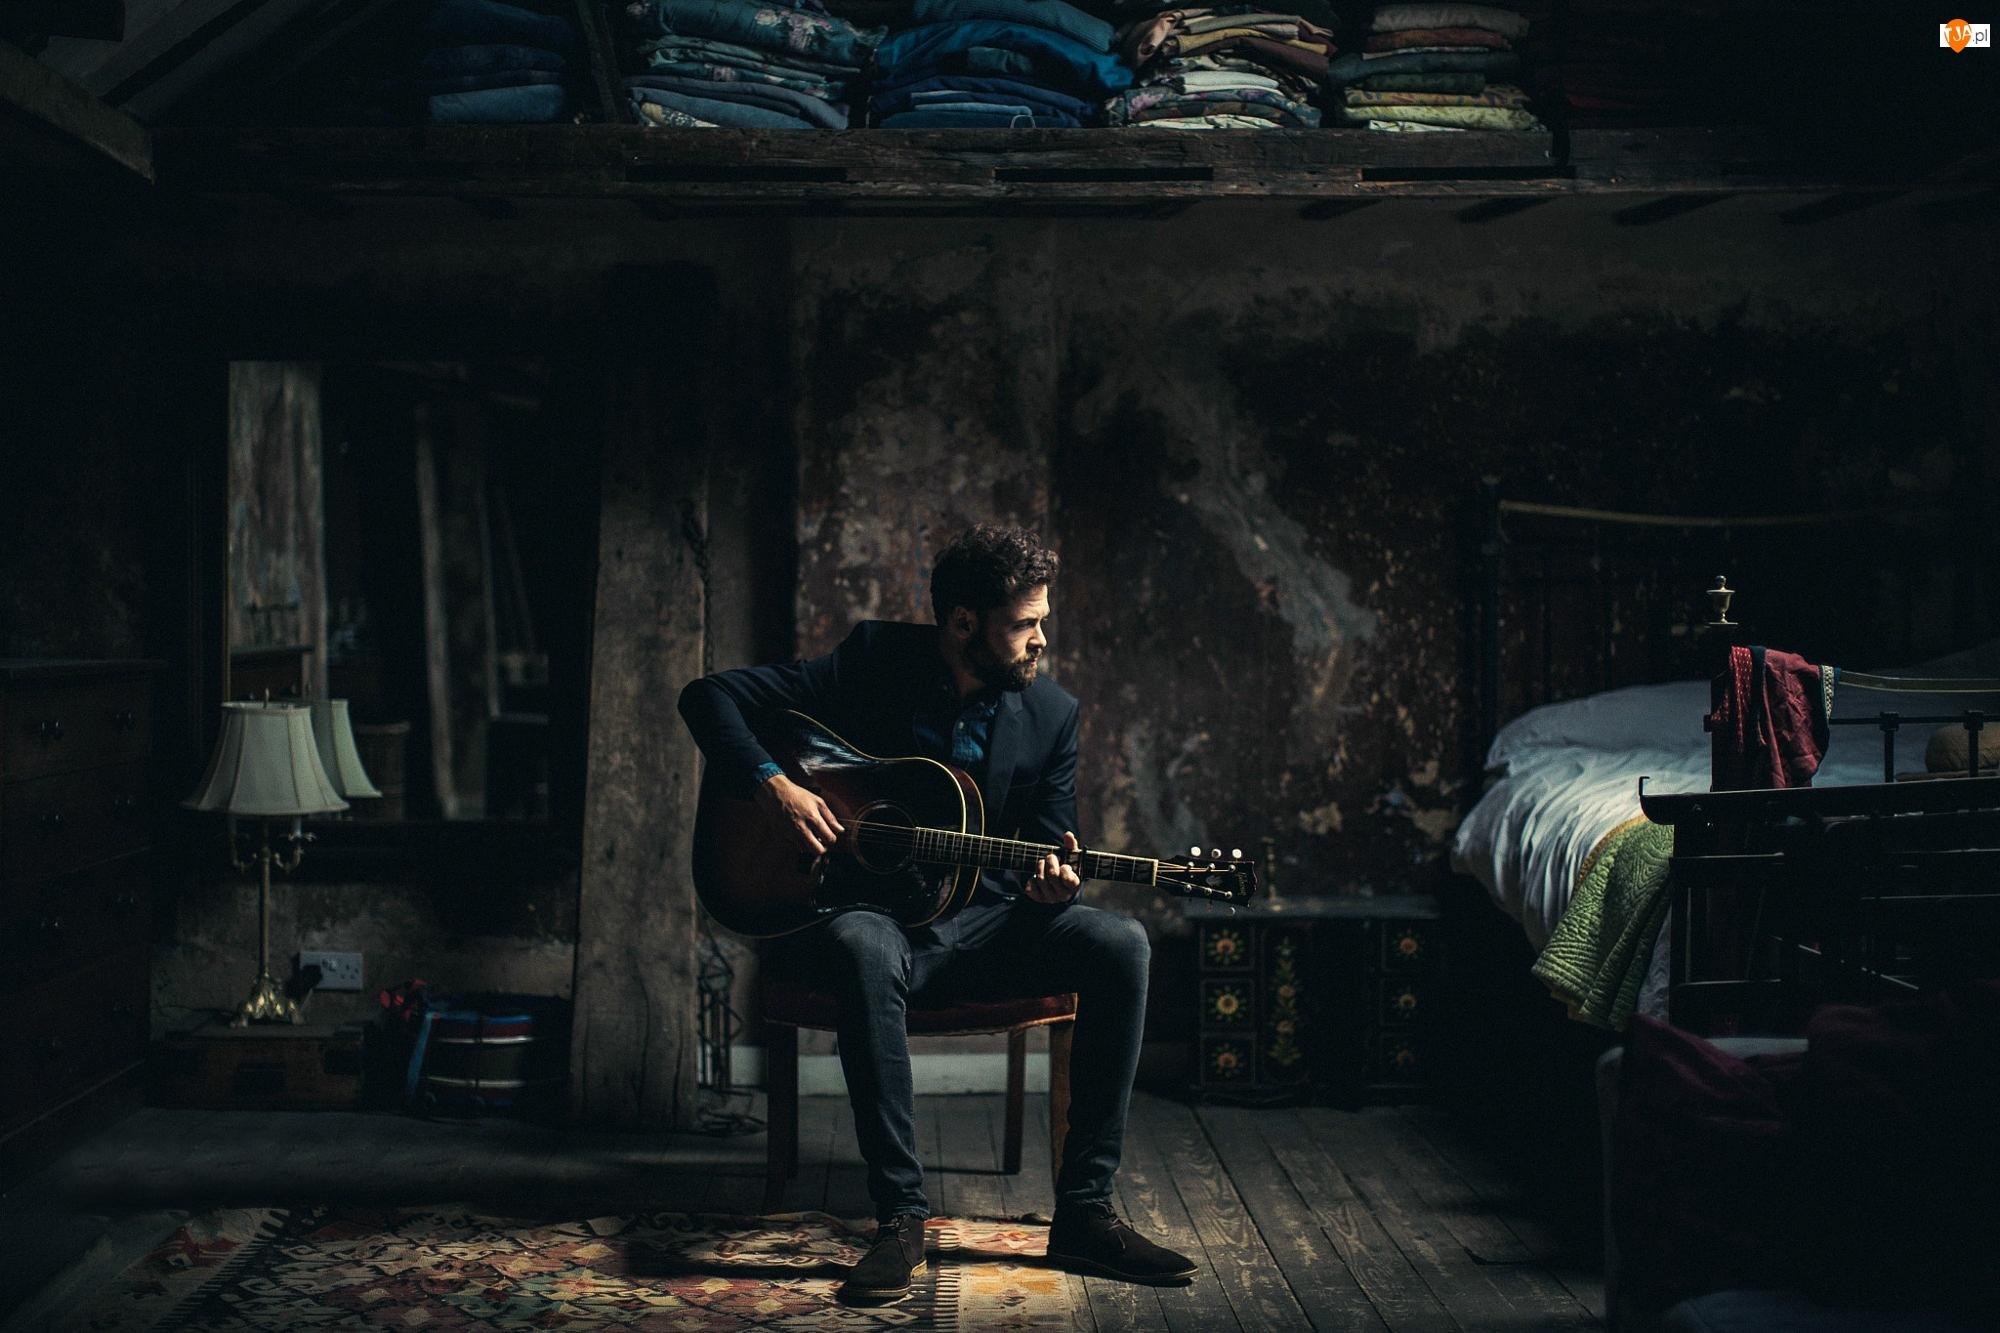 Mike Rosenberg, Wnętrze, Piosenkarz, Gitara